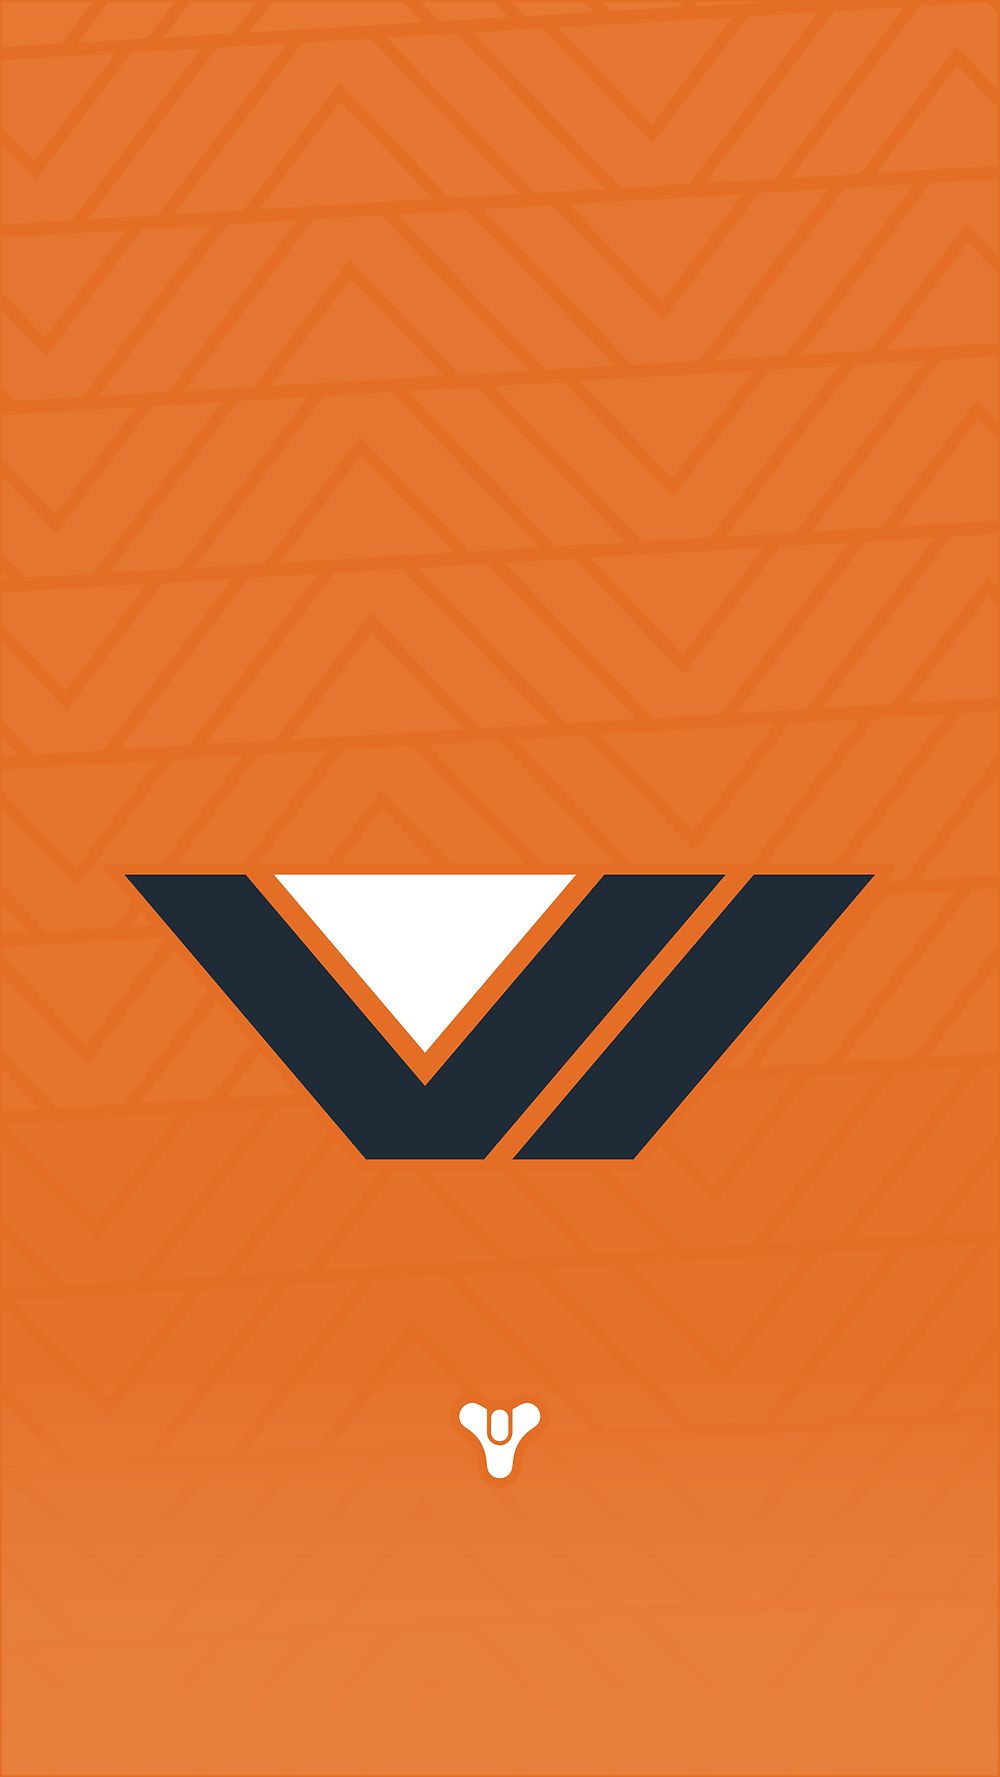 VANGUARD (Light) - 1440x2560.png